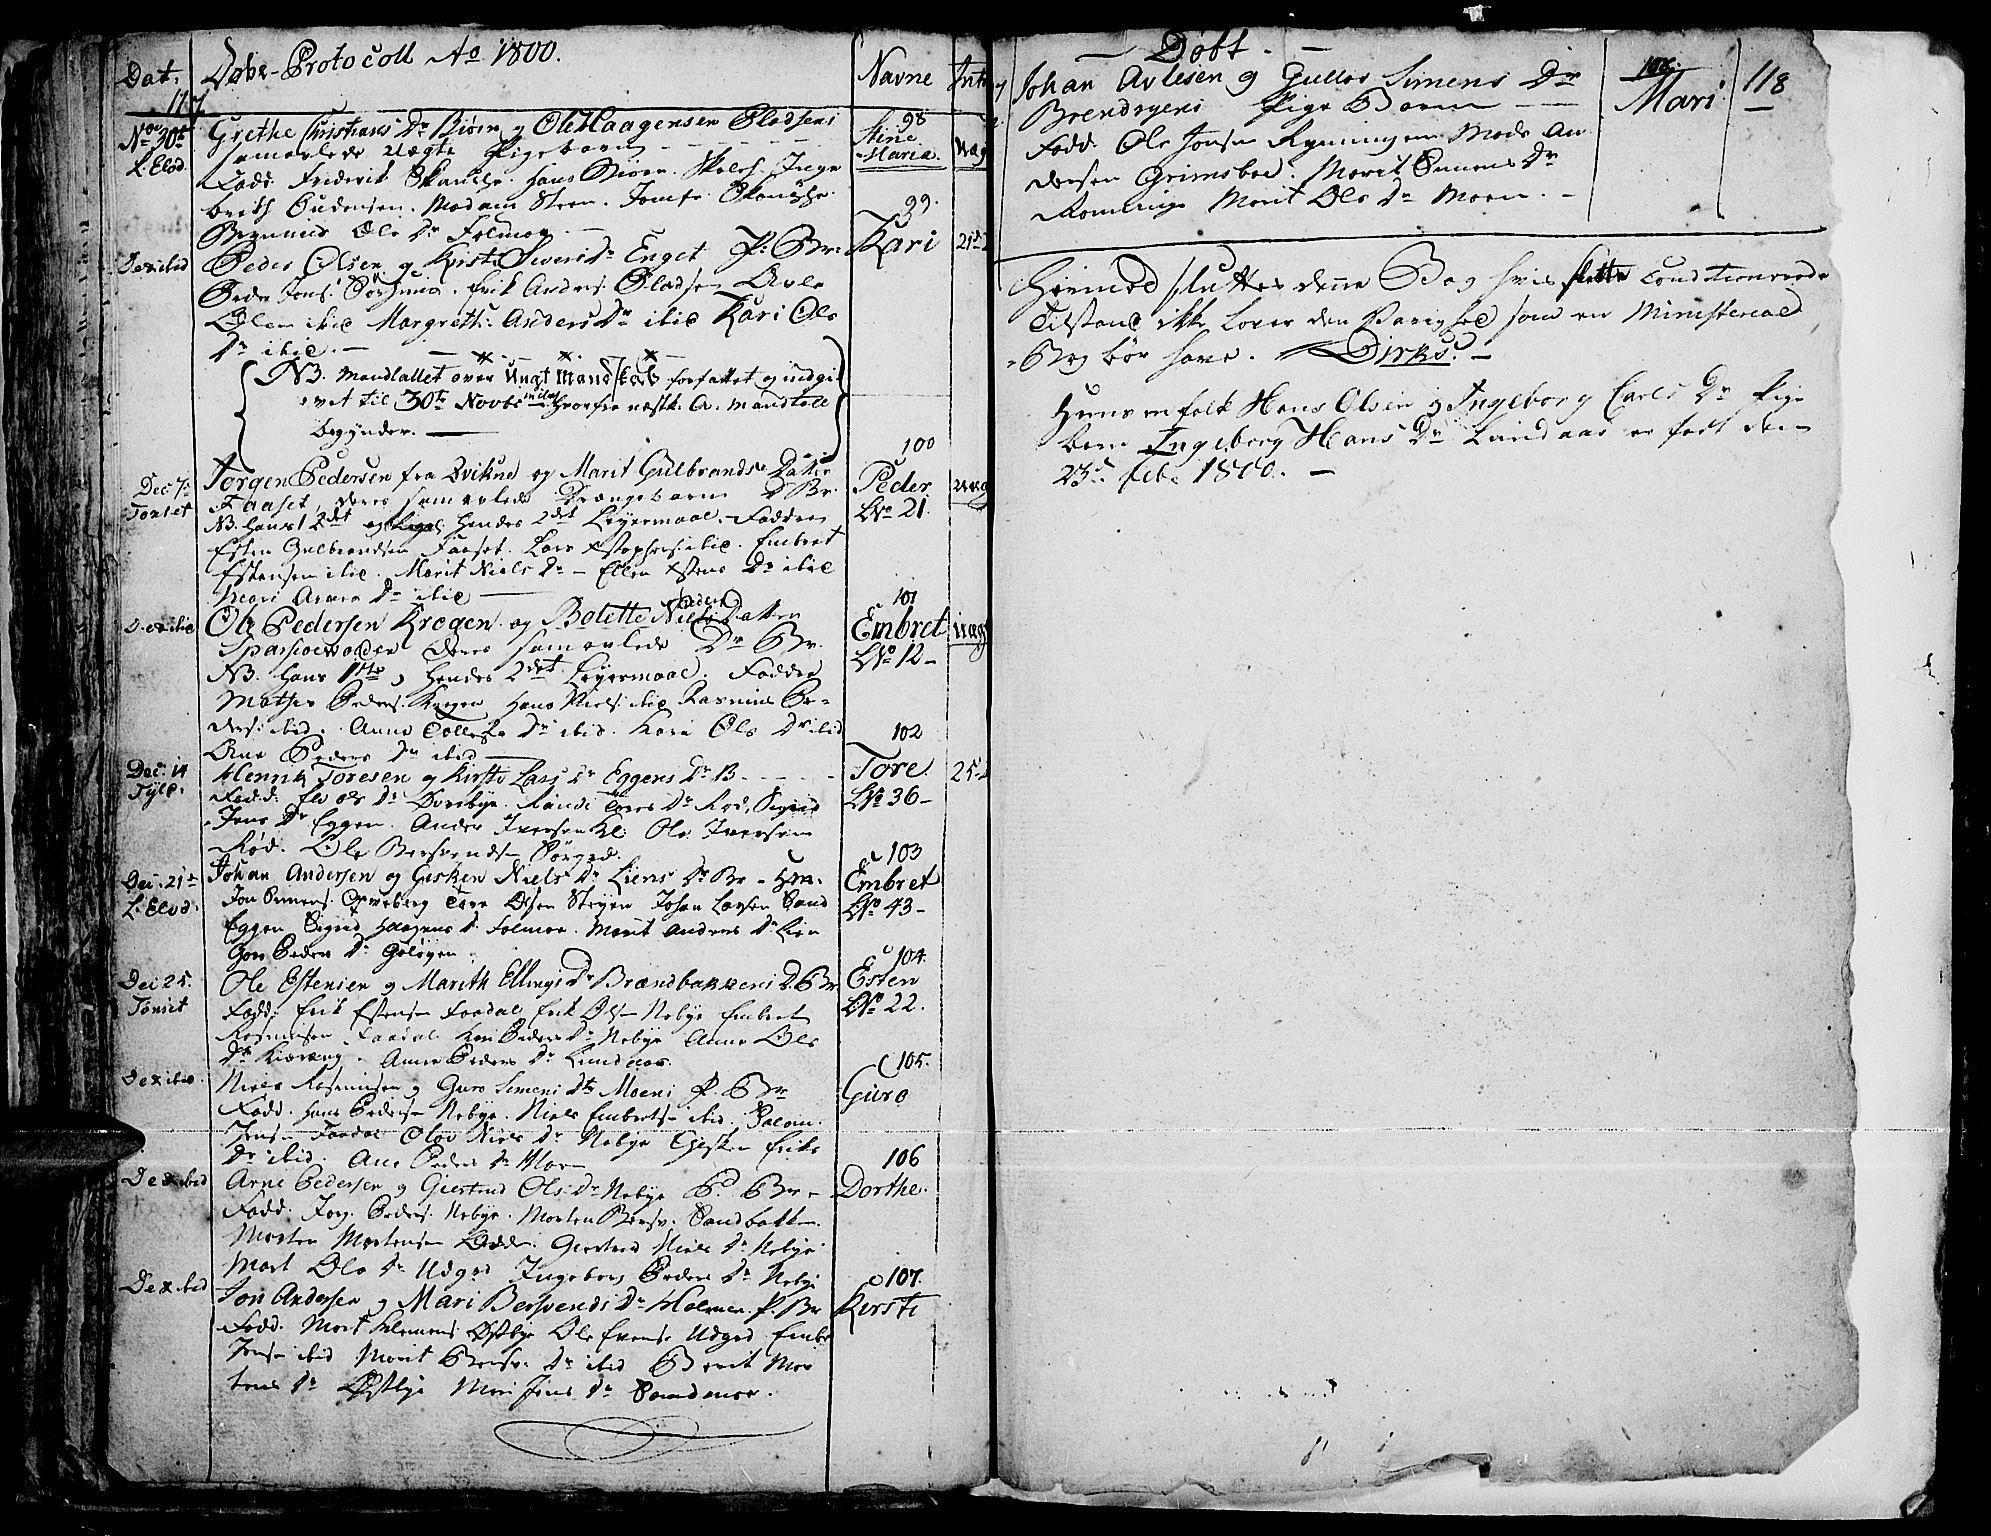 SAH, Tynset prestekontor, Ministerialbok nr. 14, 1790-1800, s. 117-118